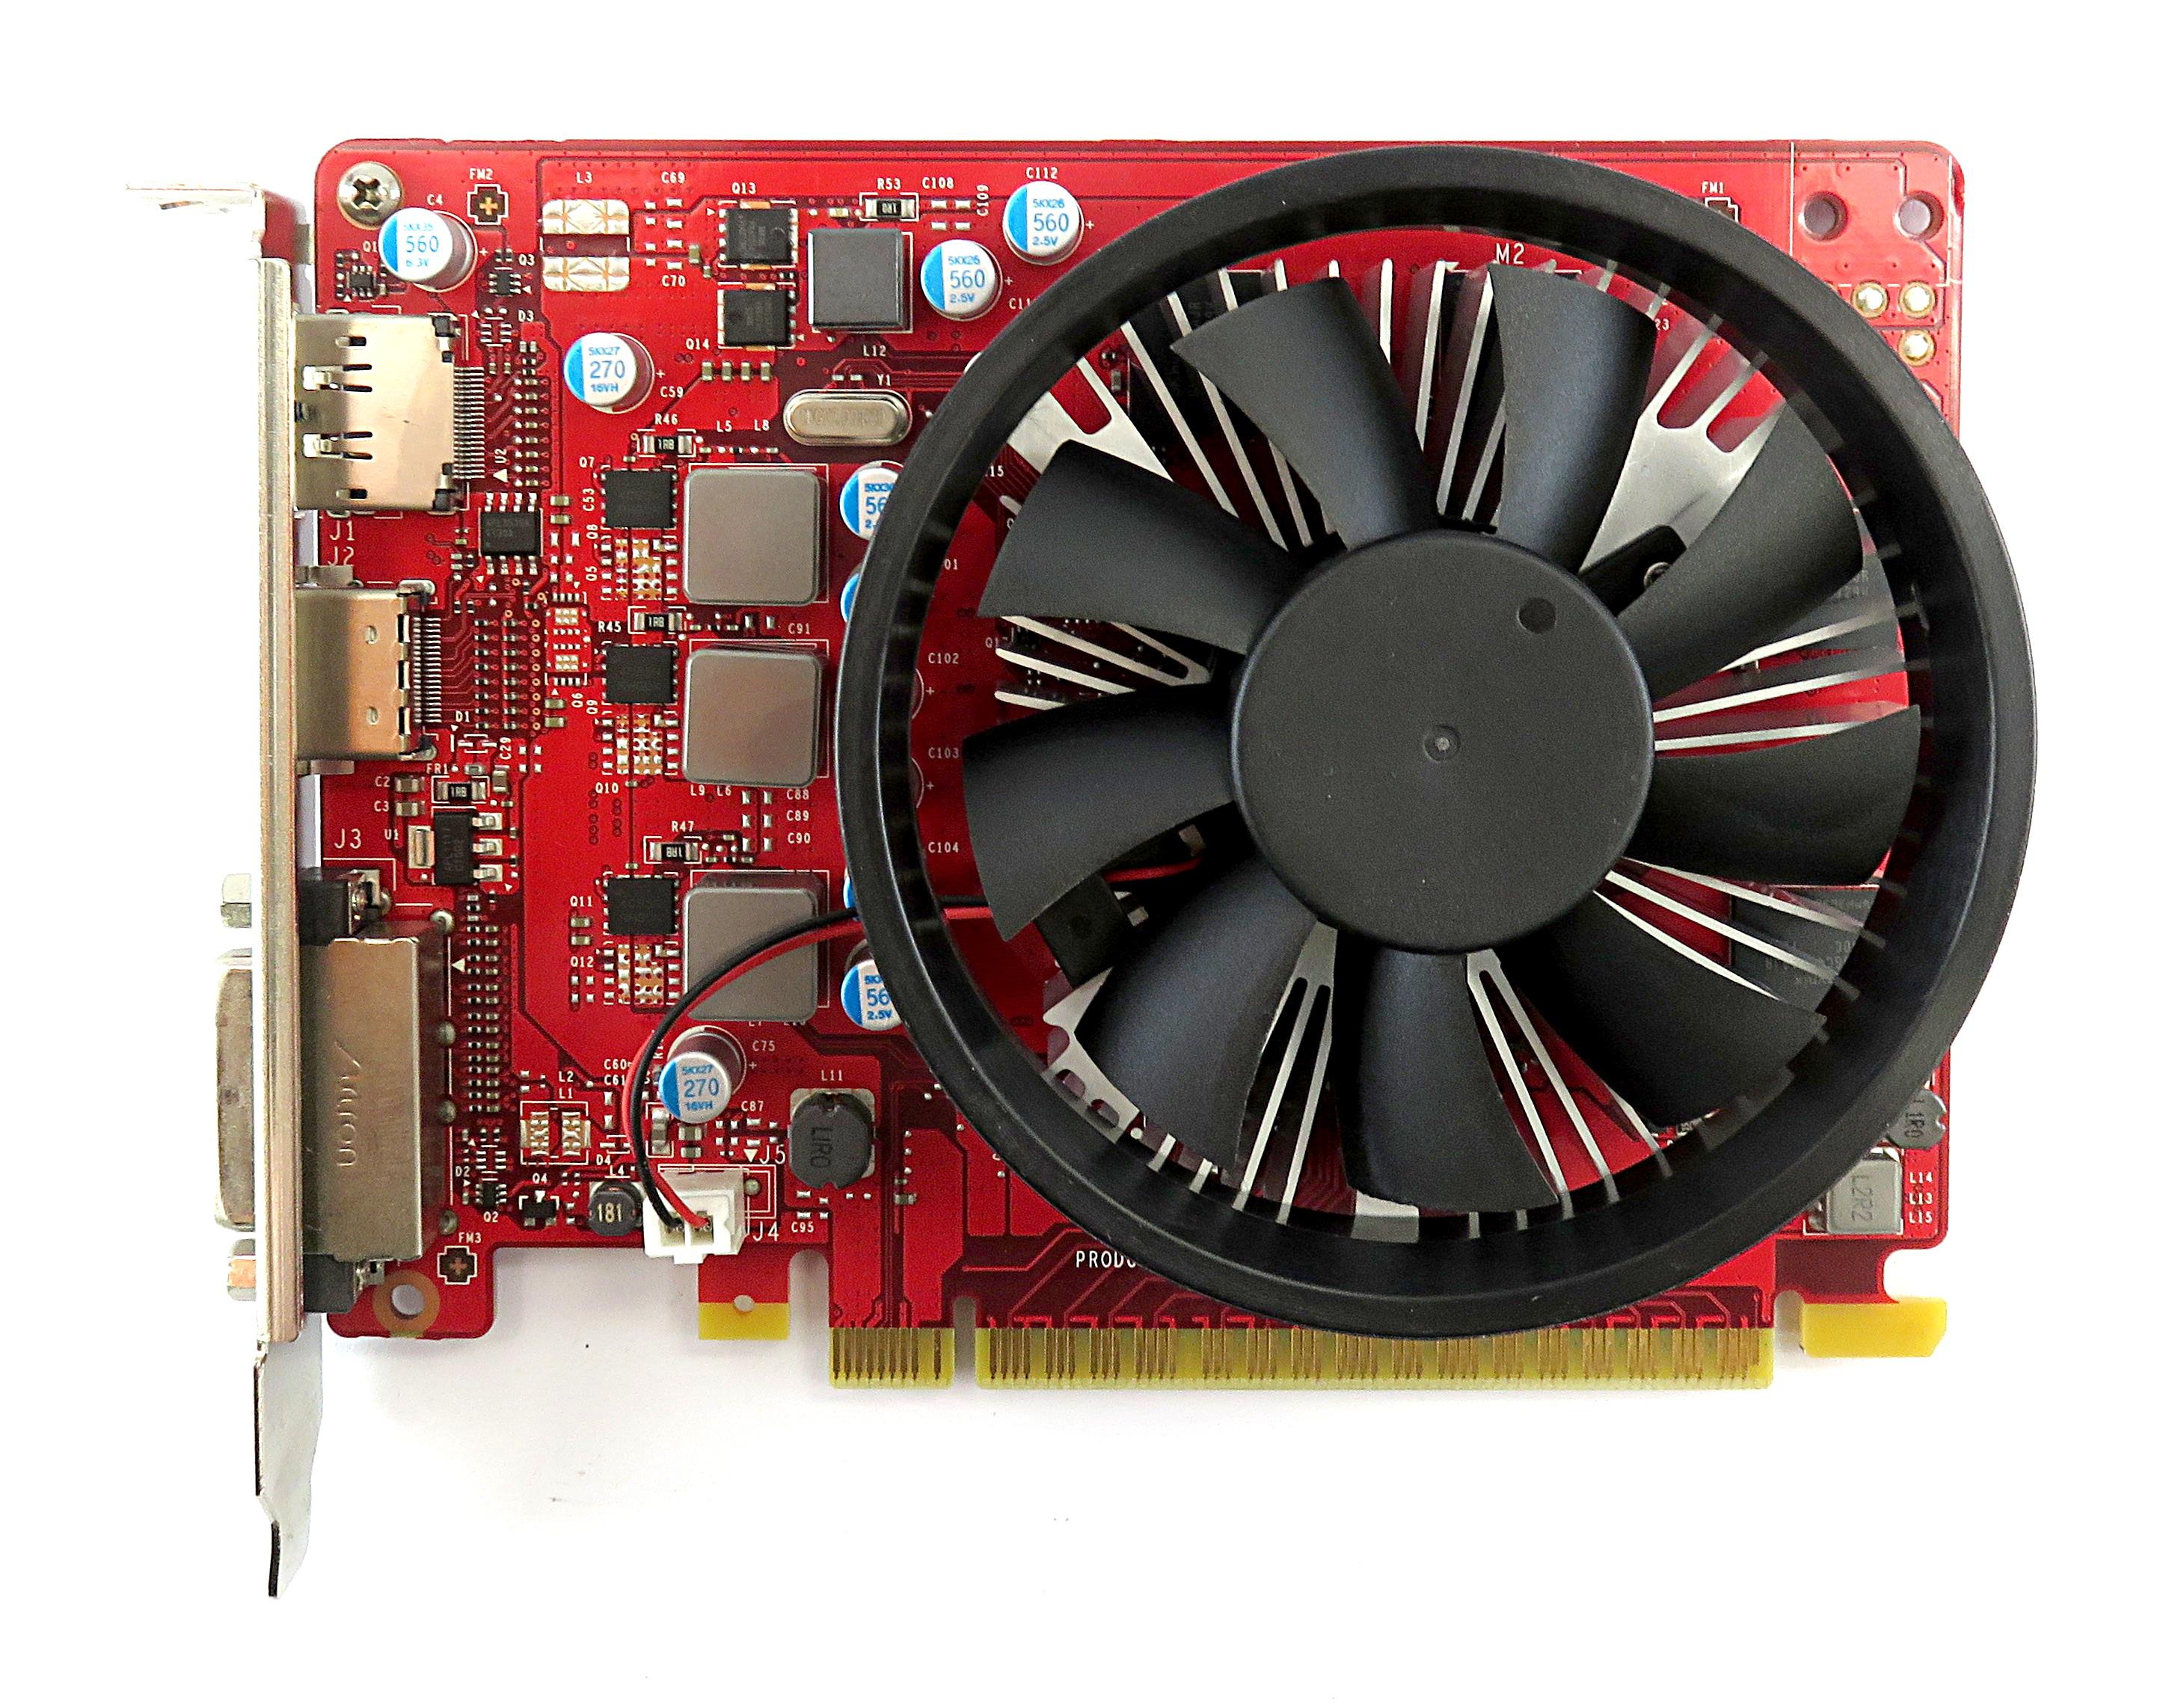 HP 918162-001 nVidia GTX 1050 2GB GDDR5 PCIe Graphics Card  DVI/DP/HDMI